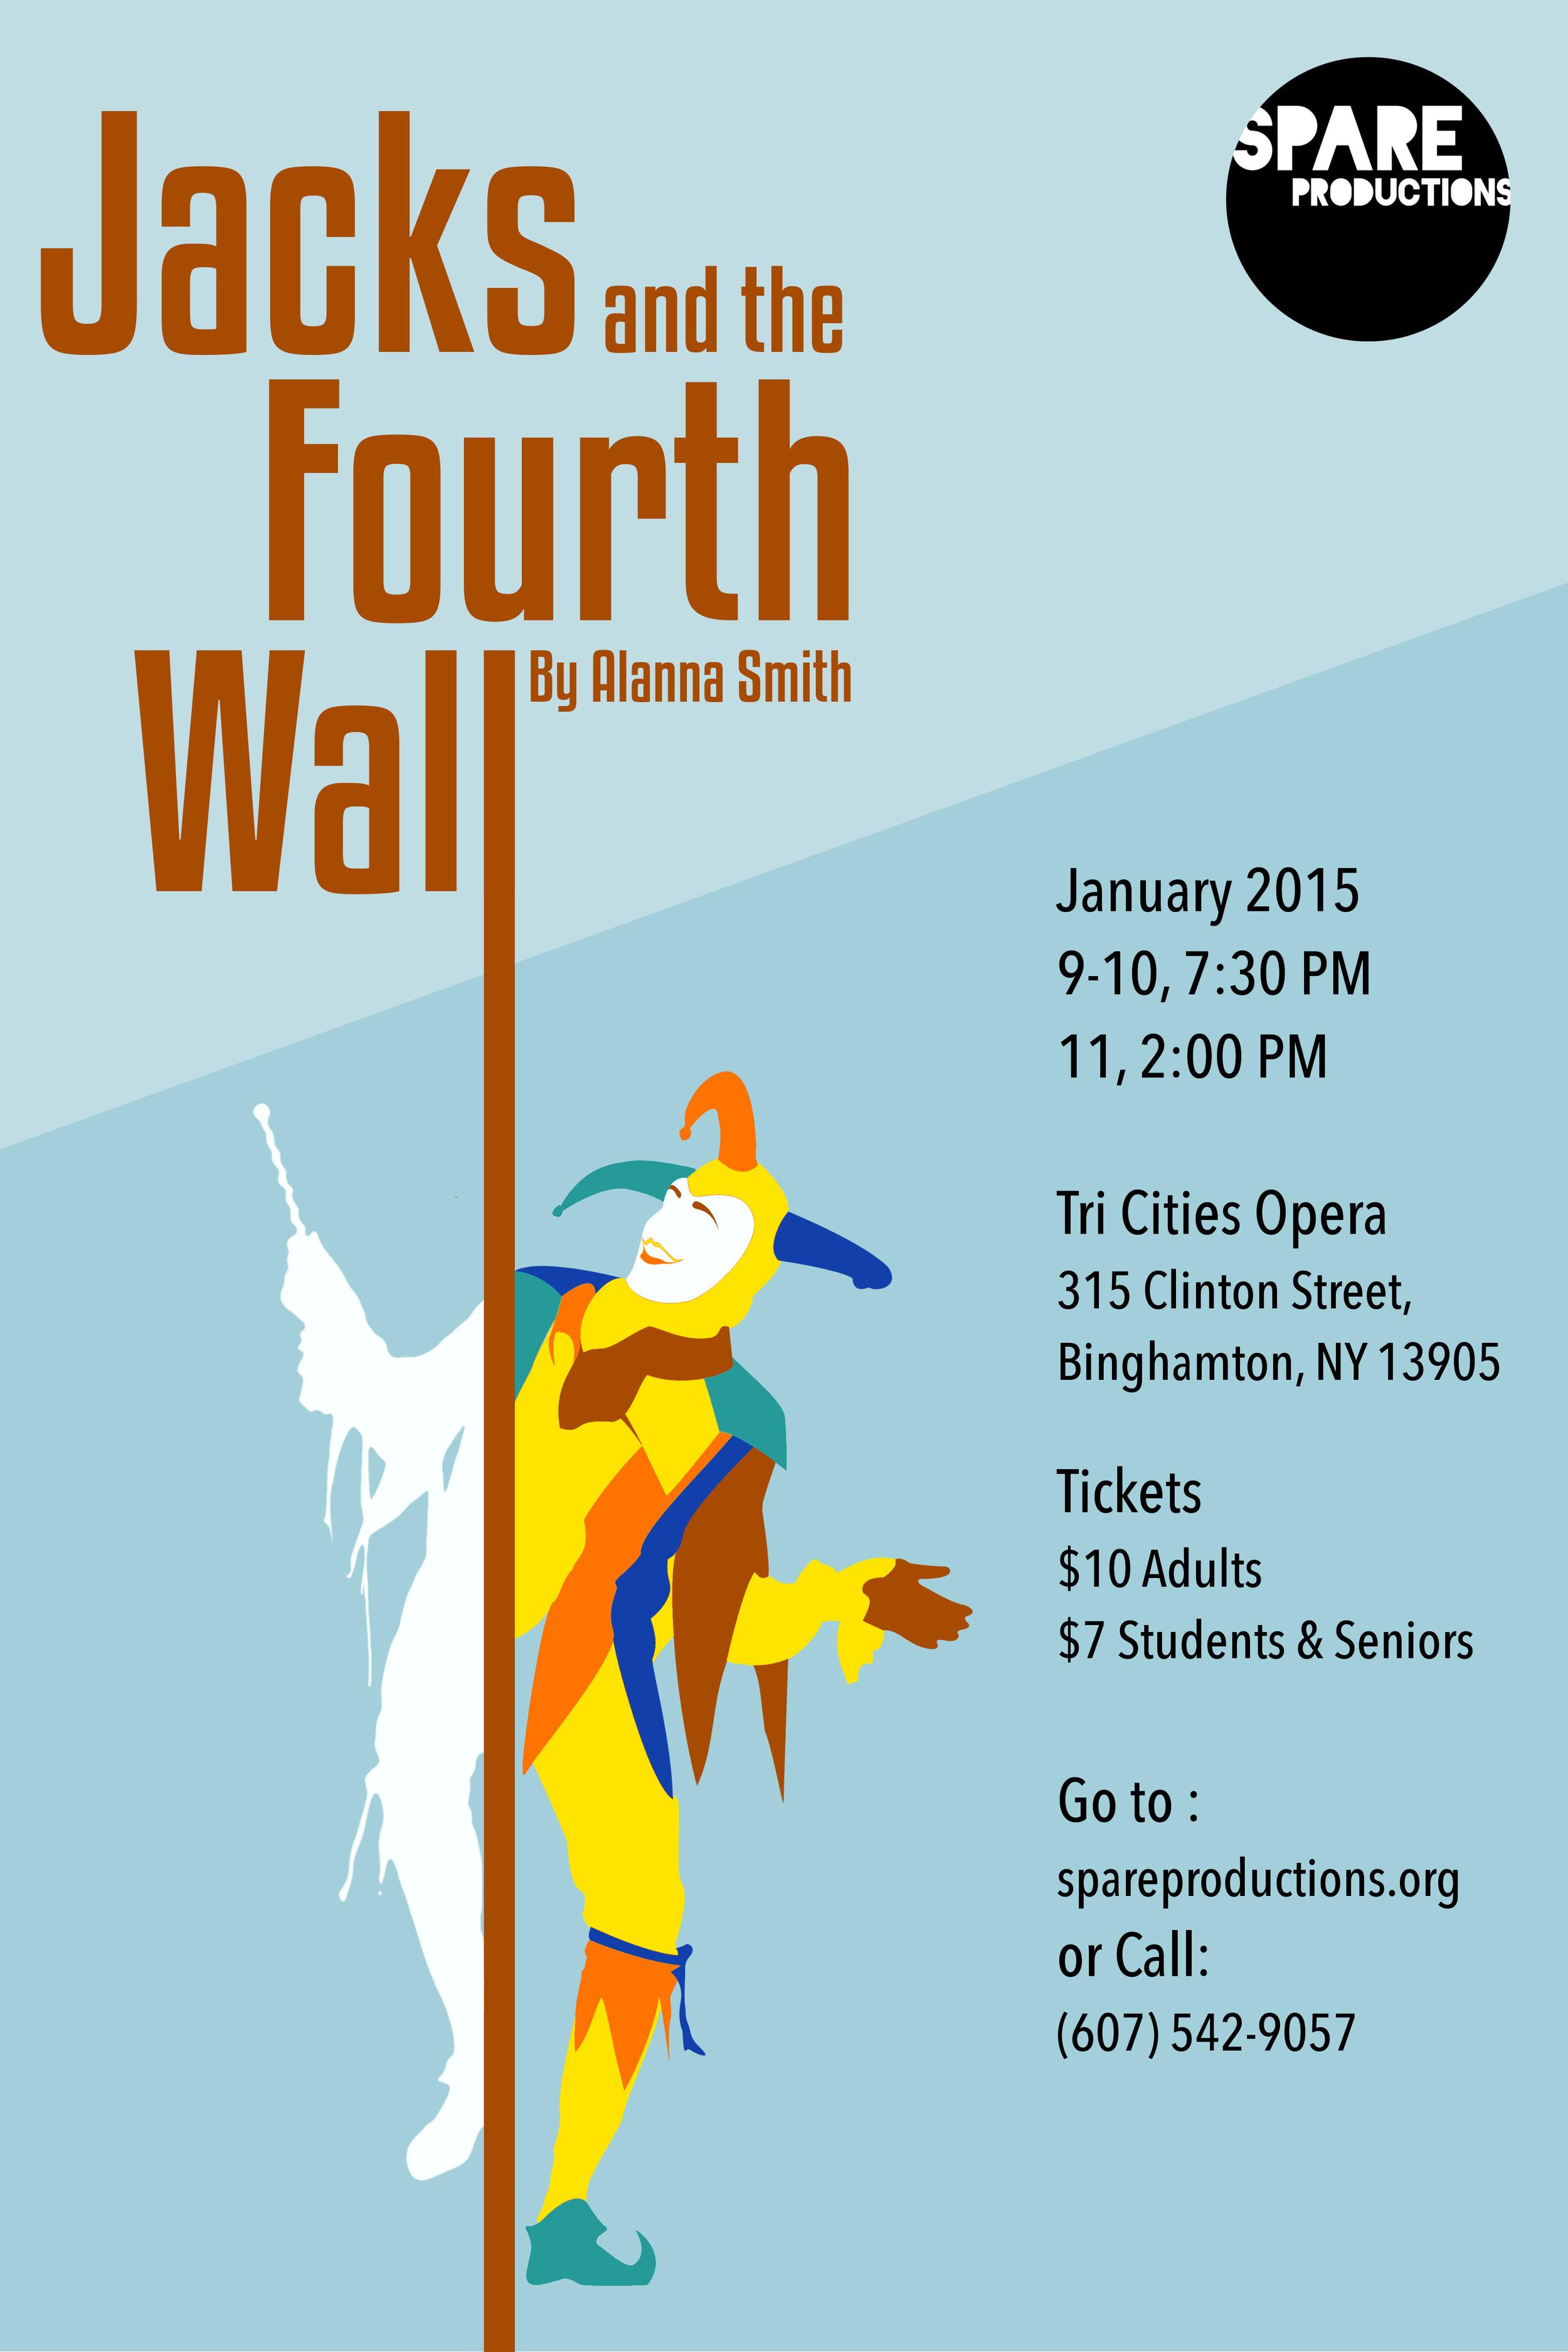 January 9-11, 2015